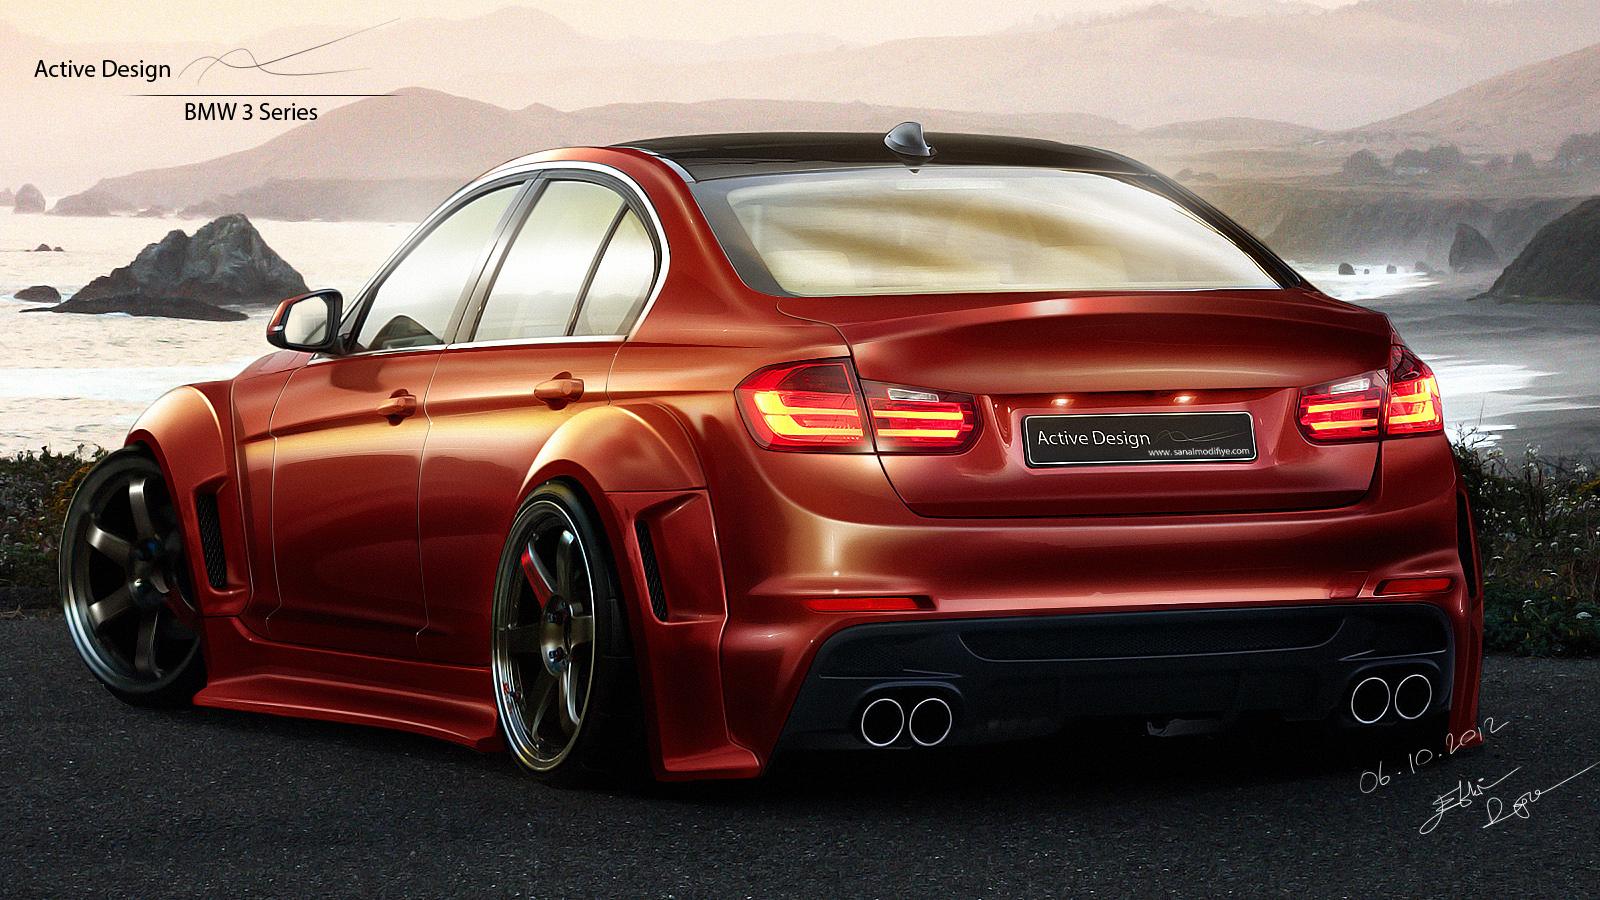 BMW 3 Series GTR by Active-Design